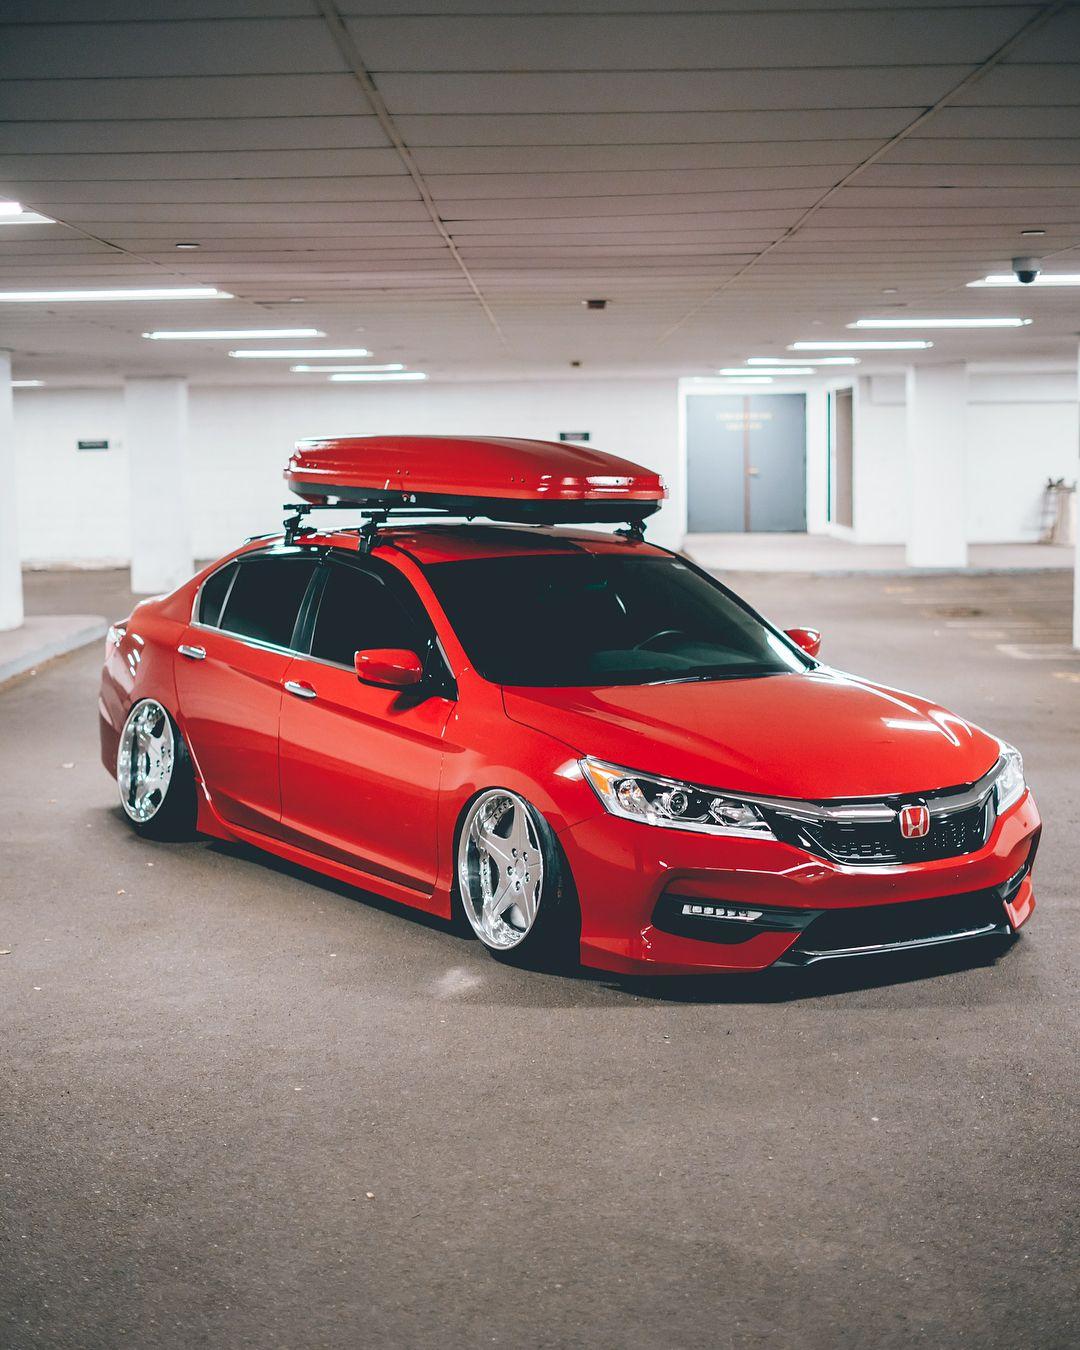 2014 Honda Civic Custom : honda, civic, custom, Pheng, Xiong, Honda, Accord,, Civic, Sedan,, Accord, Coupe